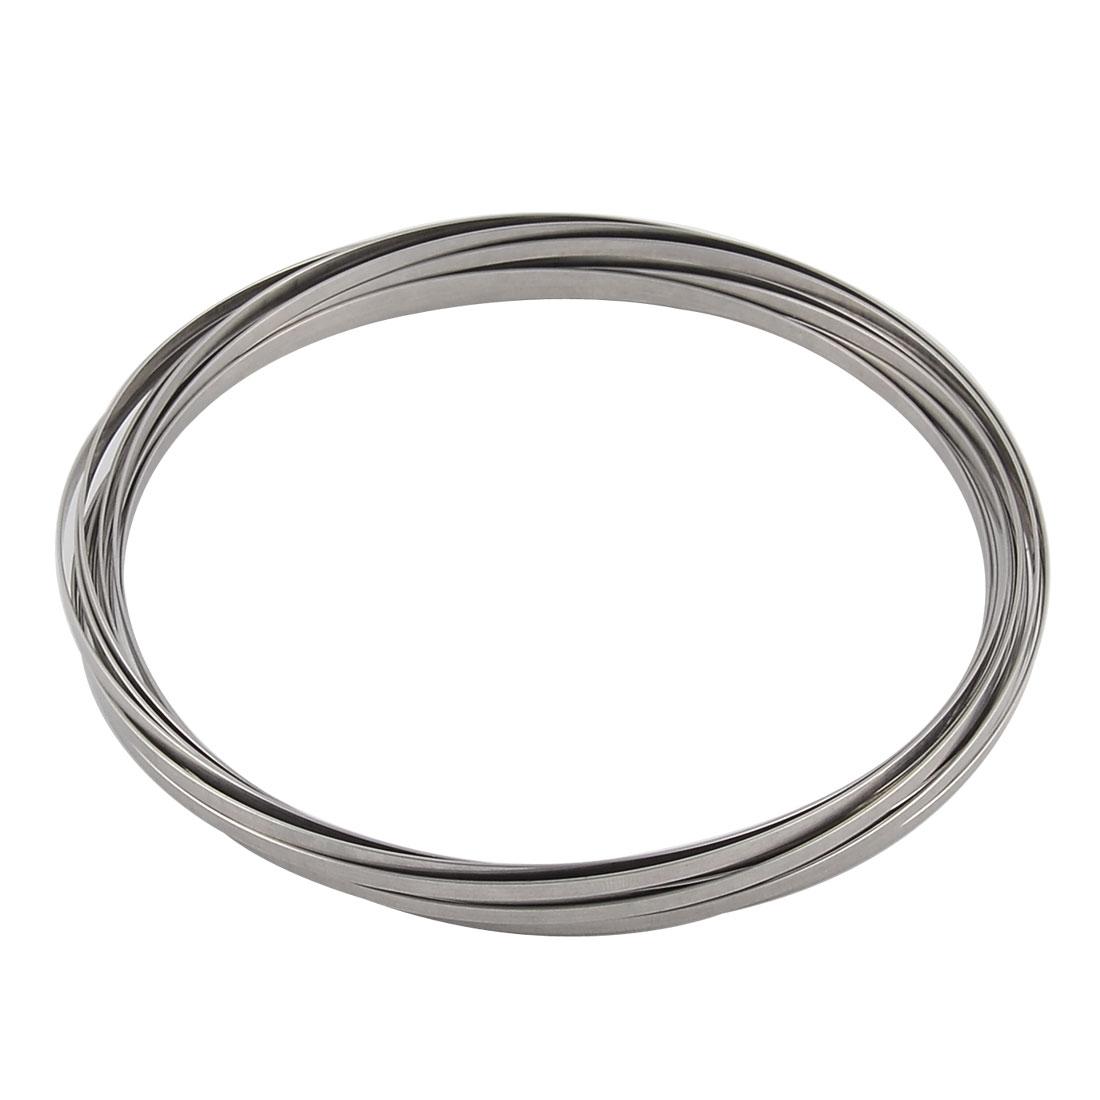 Metal Vertical Vortex Traveling Interactive Kinetic Spring Toy Flow Ring